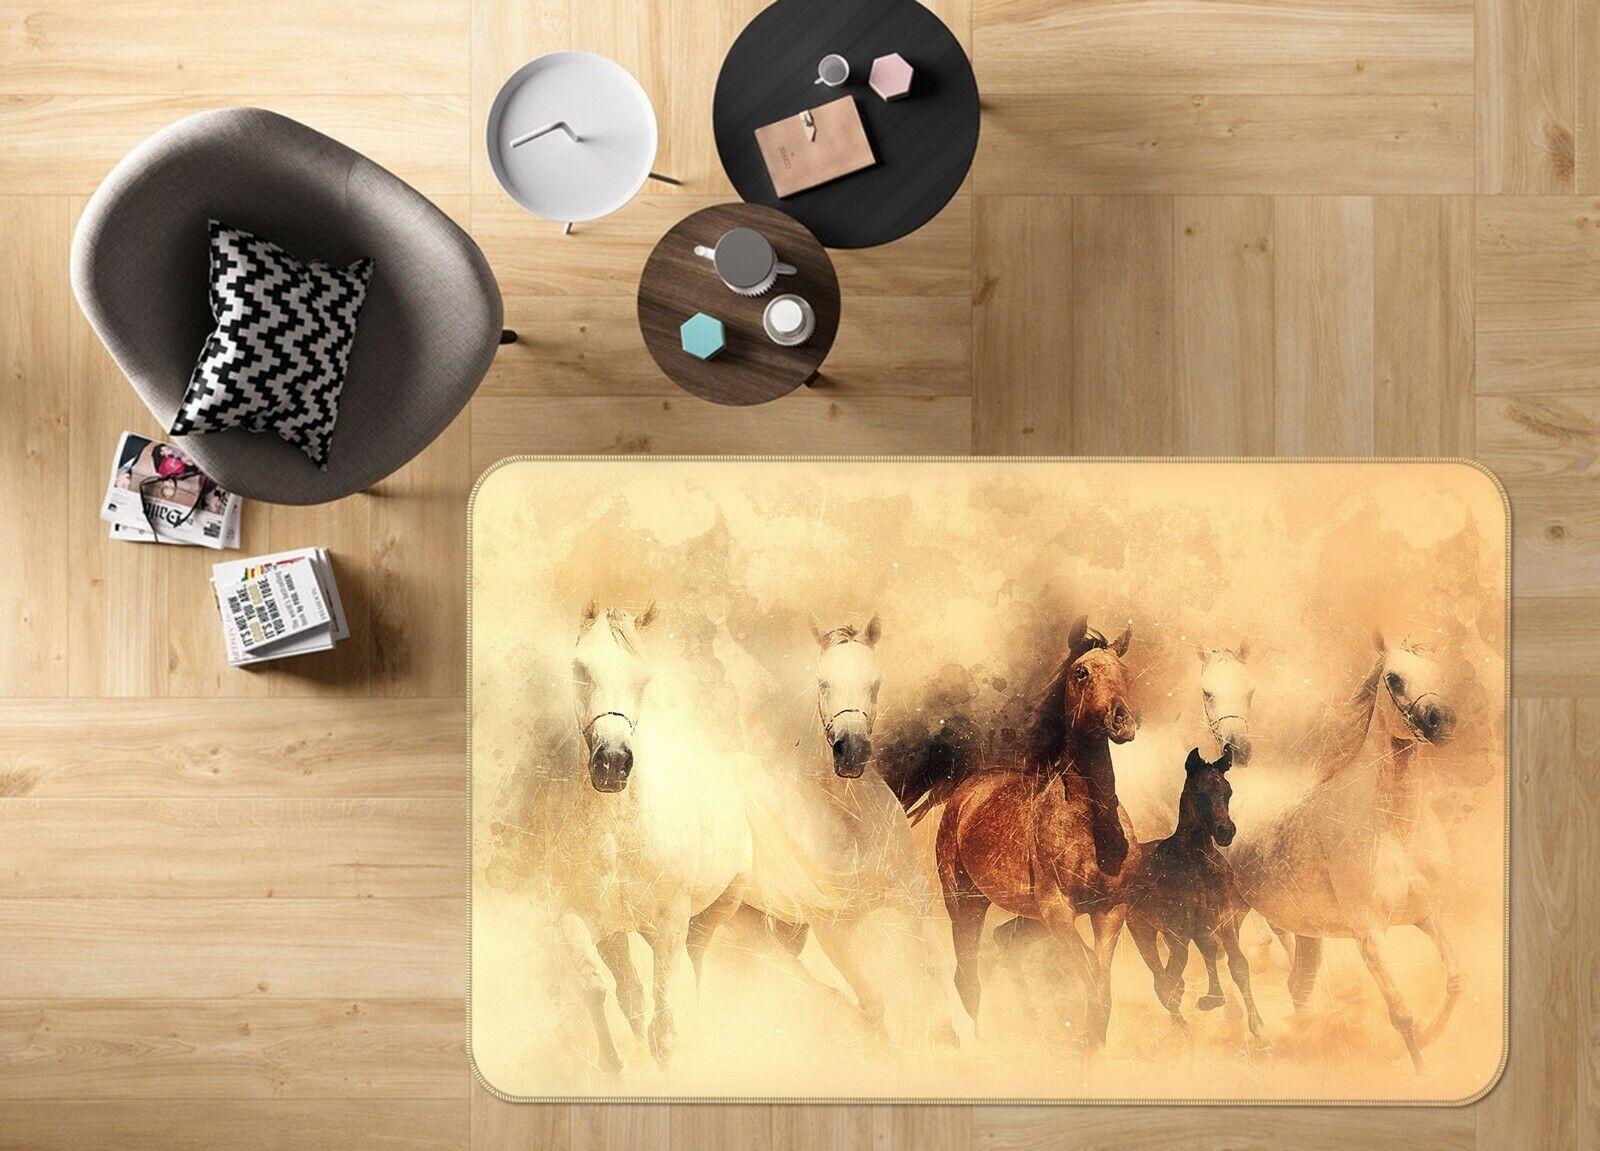 3D dipinto cavallo C076 Animale tappetino antiscivolo tappeto rossoondo elegante Tappeto Wendy